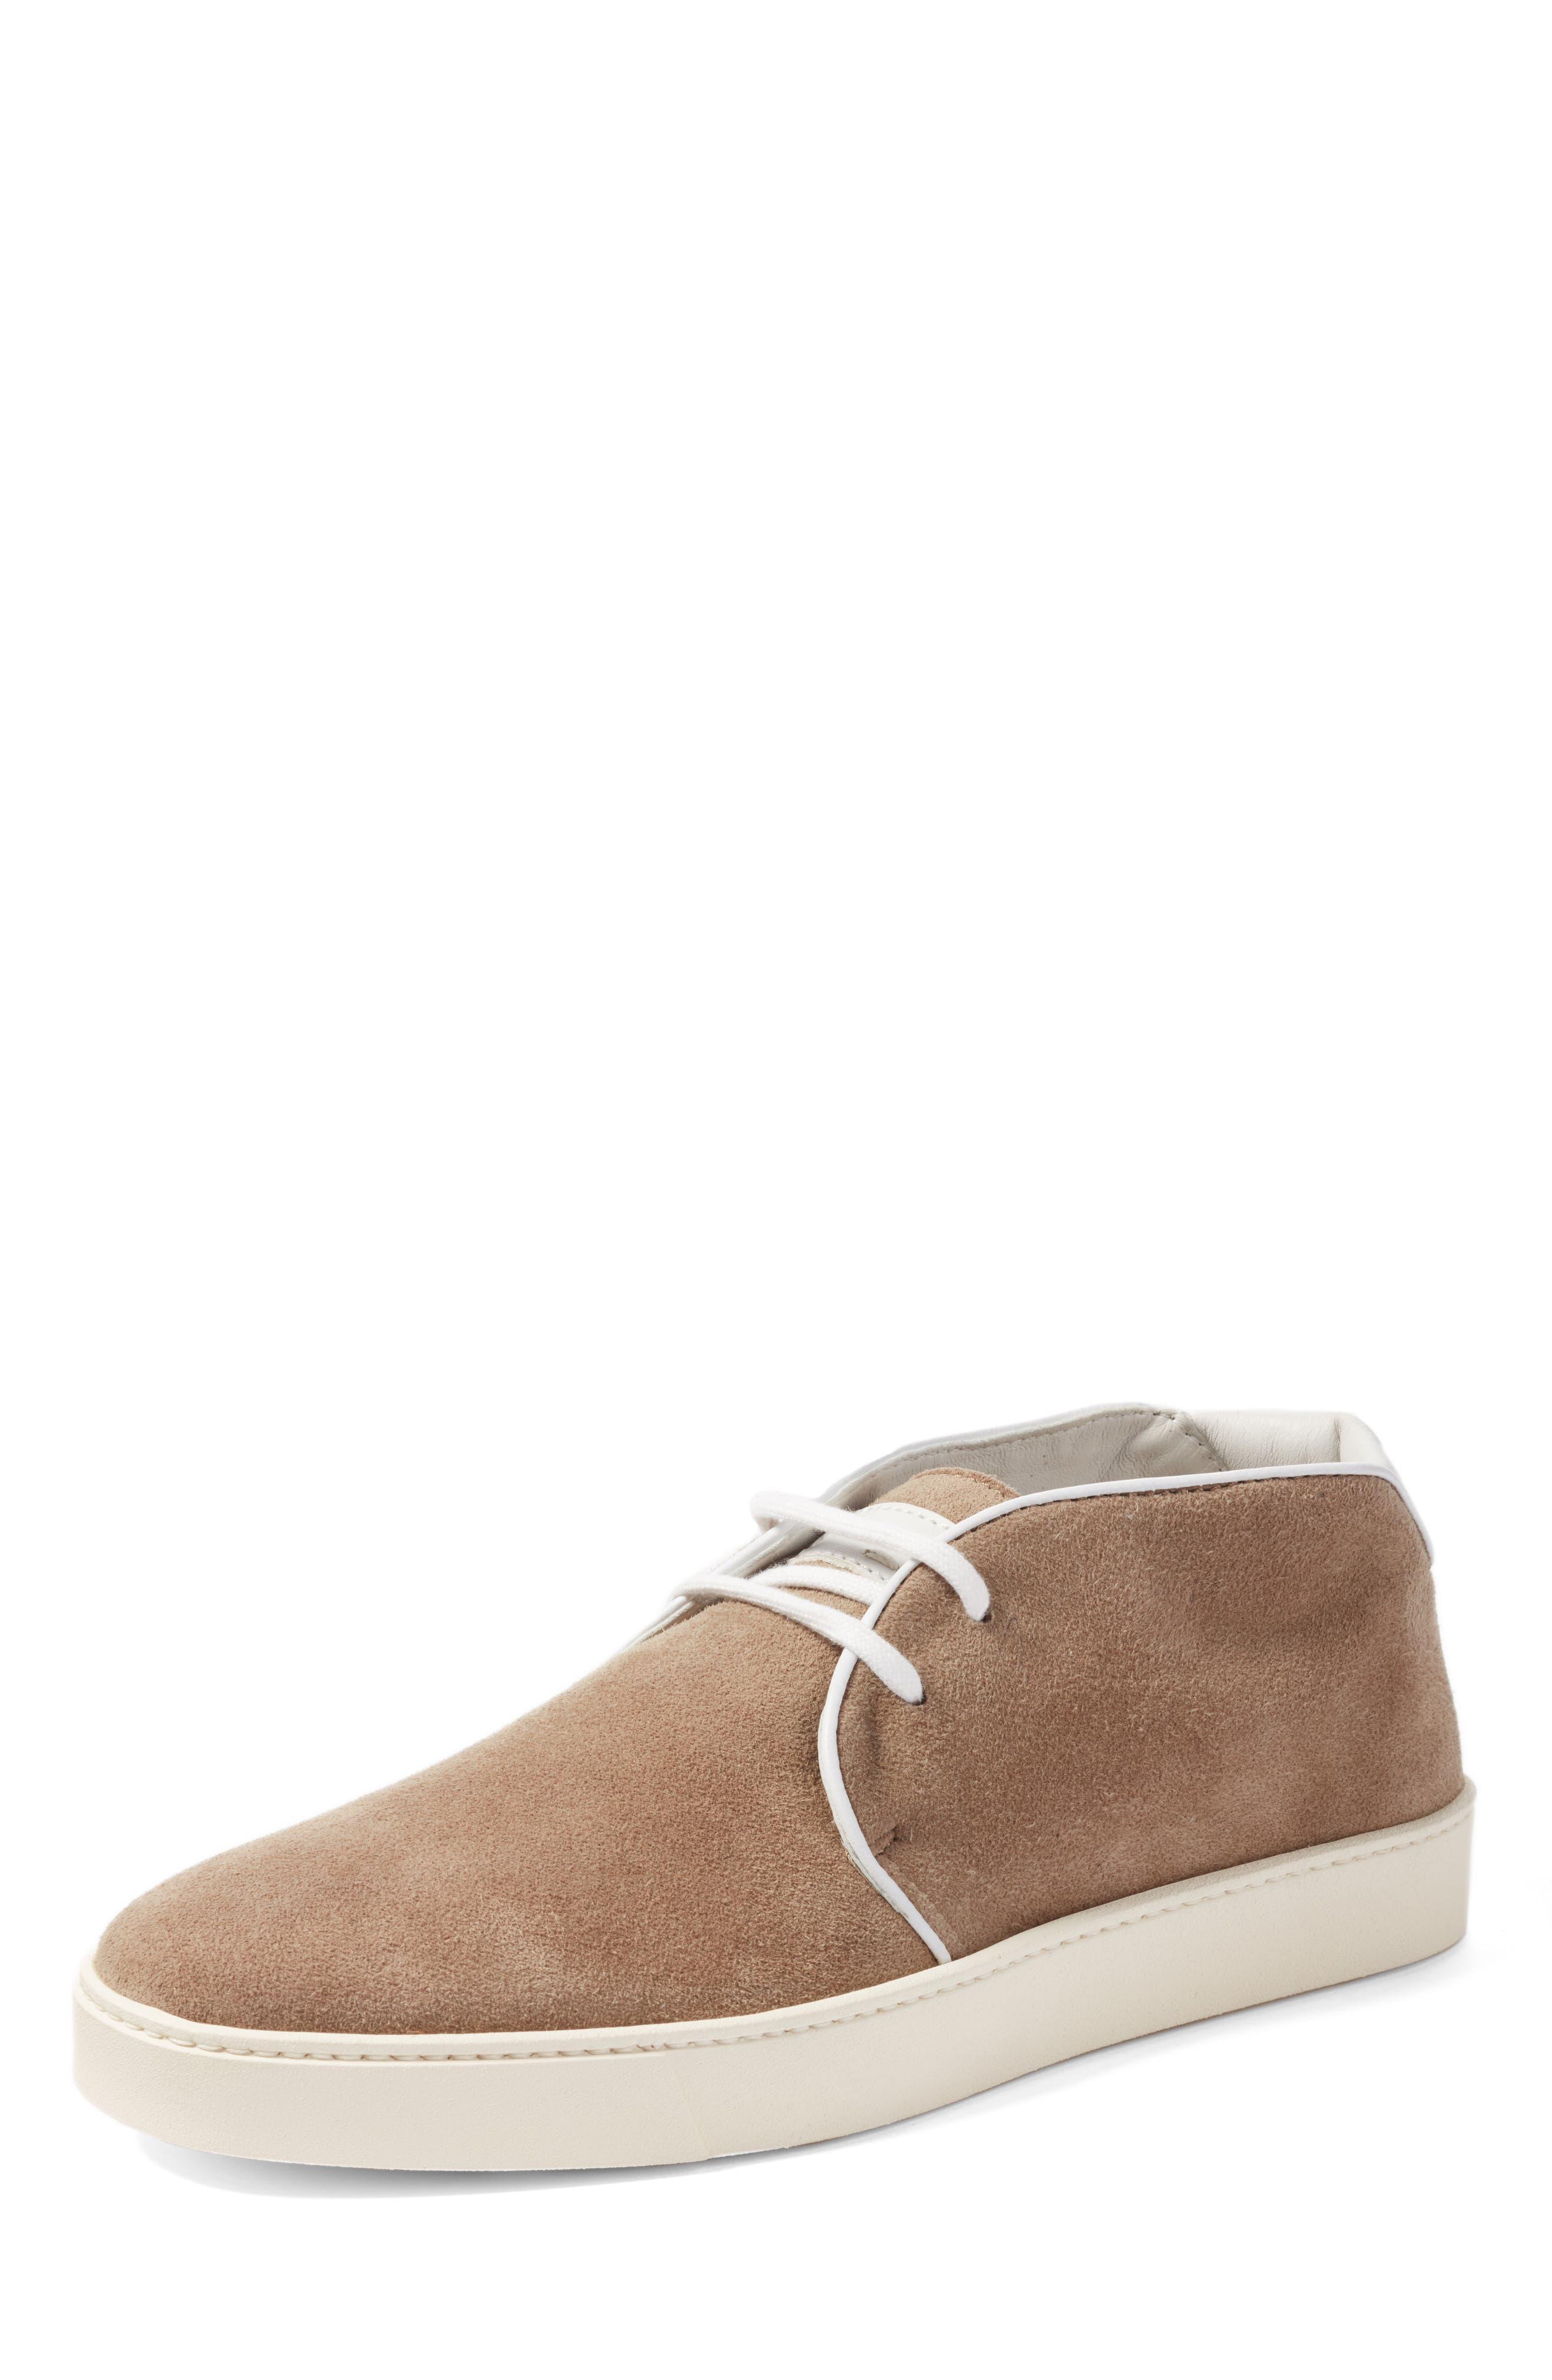 Alternate Image 1 Selected - Santoni Huron Chukka Sneaker (Men)